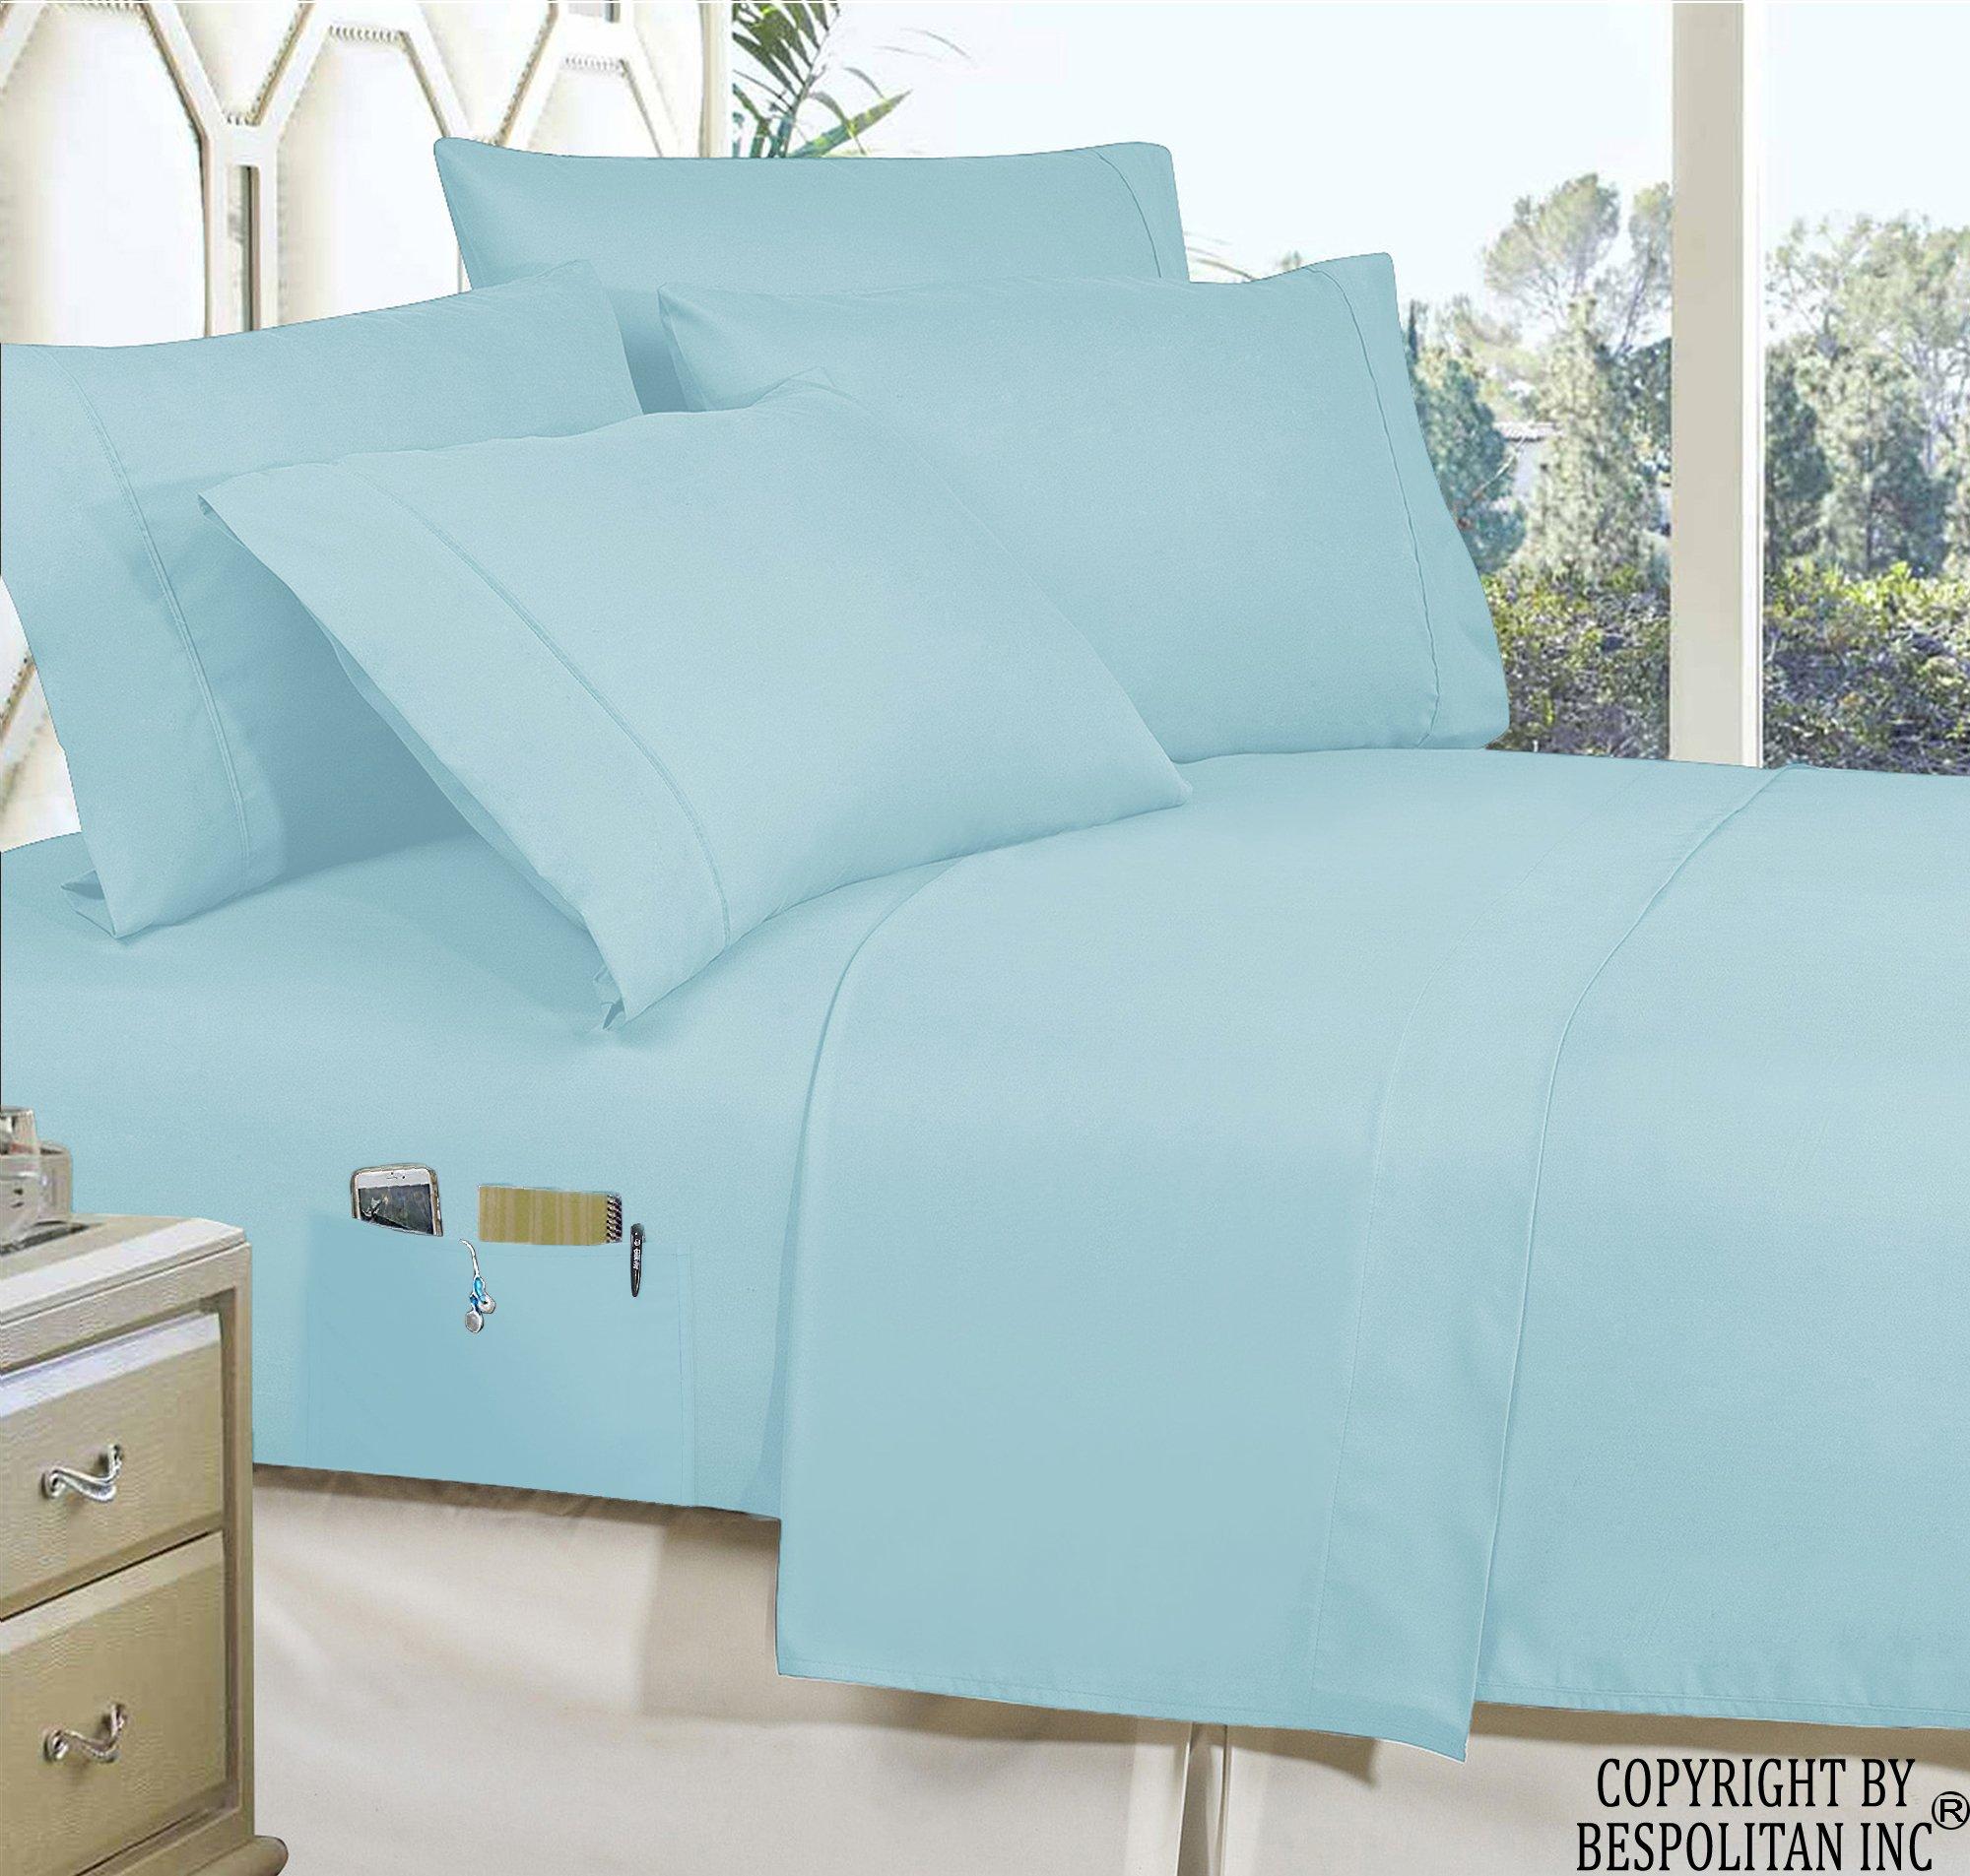 Elegant Comfort 4 件套床上用品智能床单套装! 奢华柔软 1500 支埃及优质防皱侧储物口袋,单人床,双人床,大号双人床,加州大号双人床,加州大号双人床 浅蓝色 Queen SmartSheet-Queen Aqua